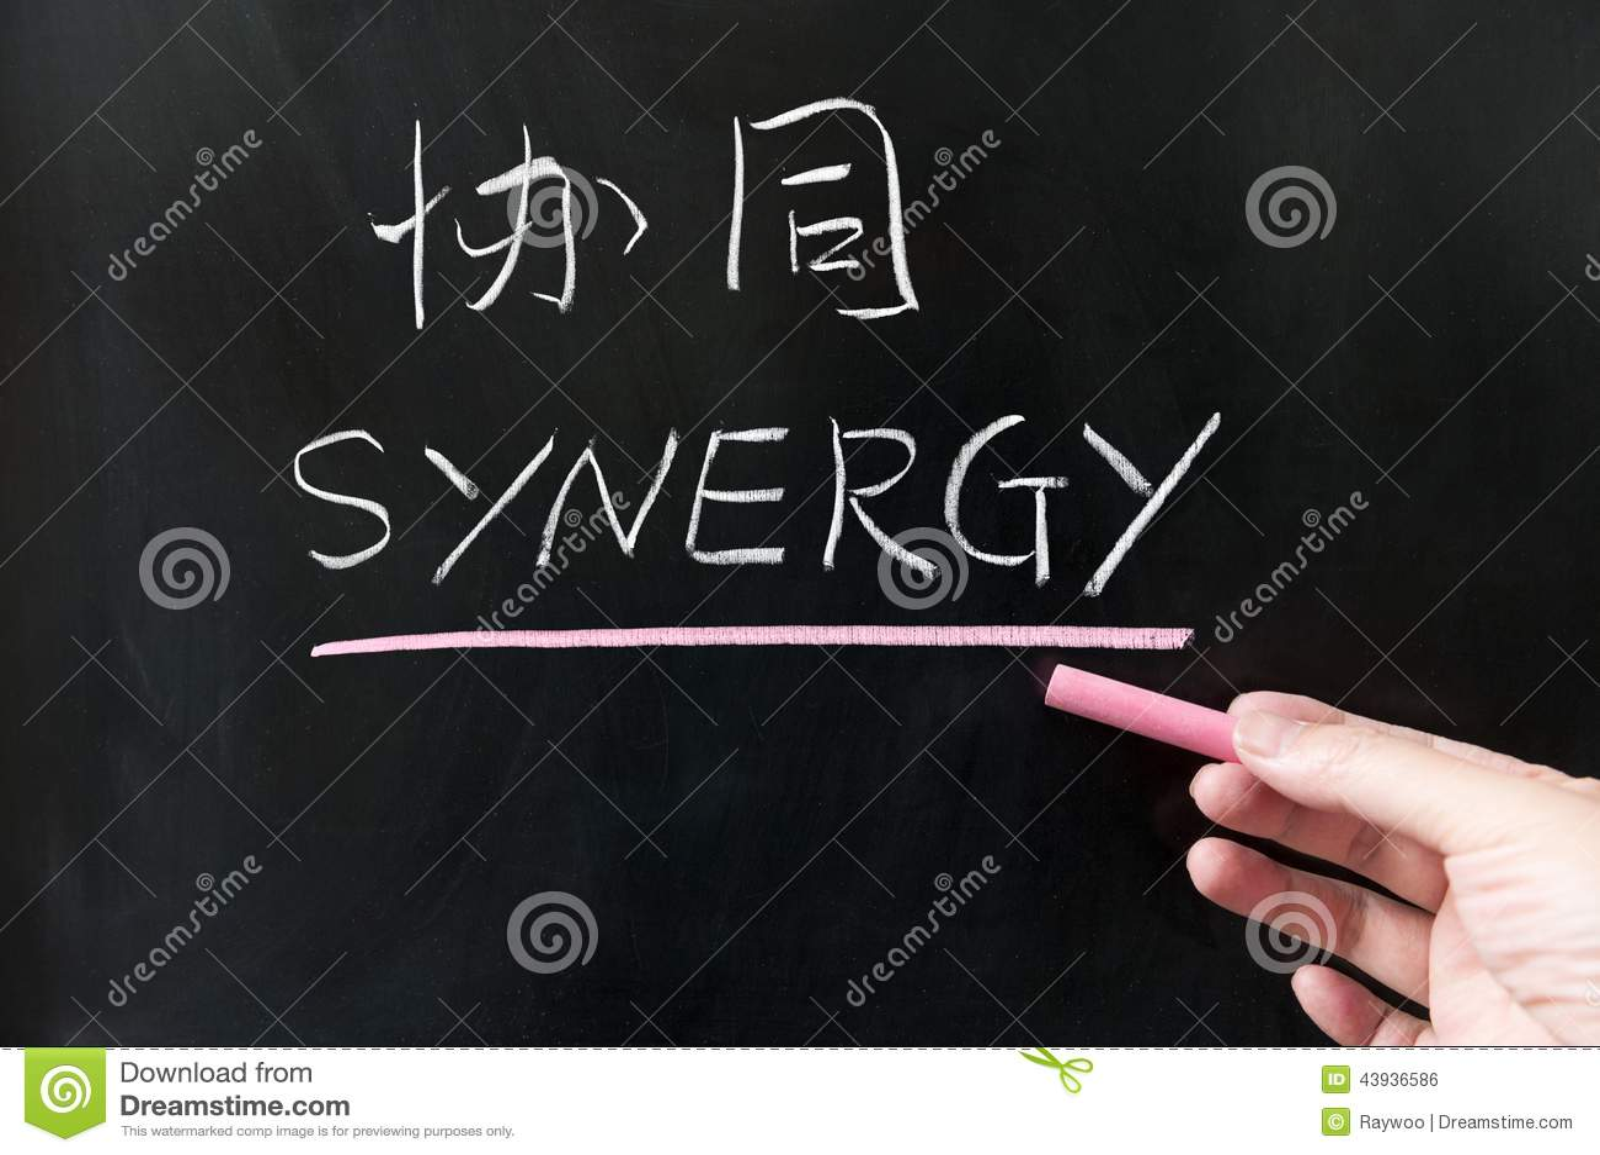 Synergismeconcept